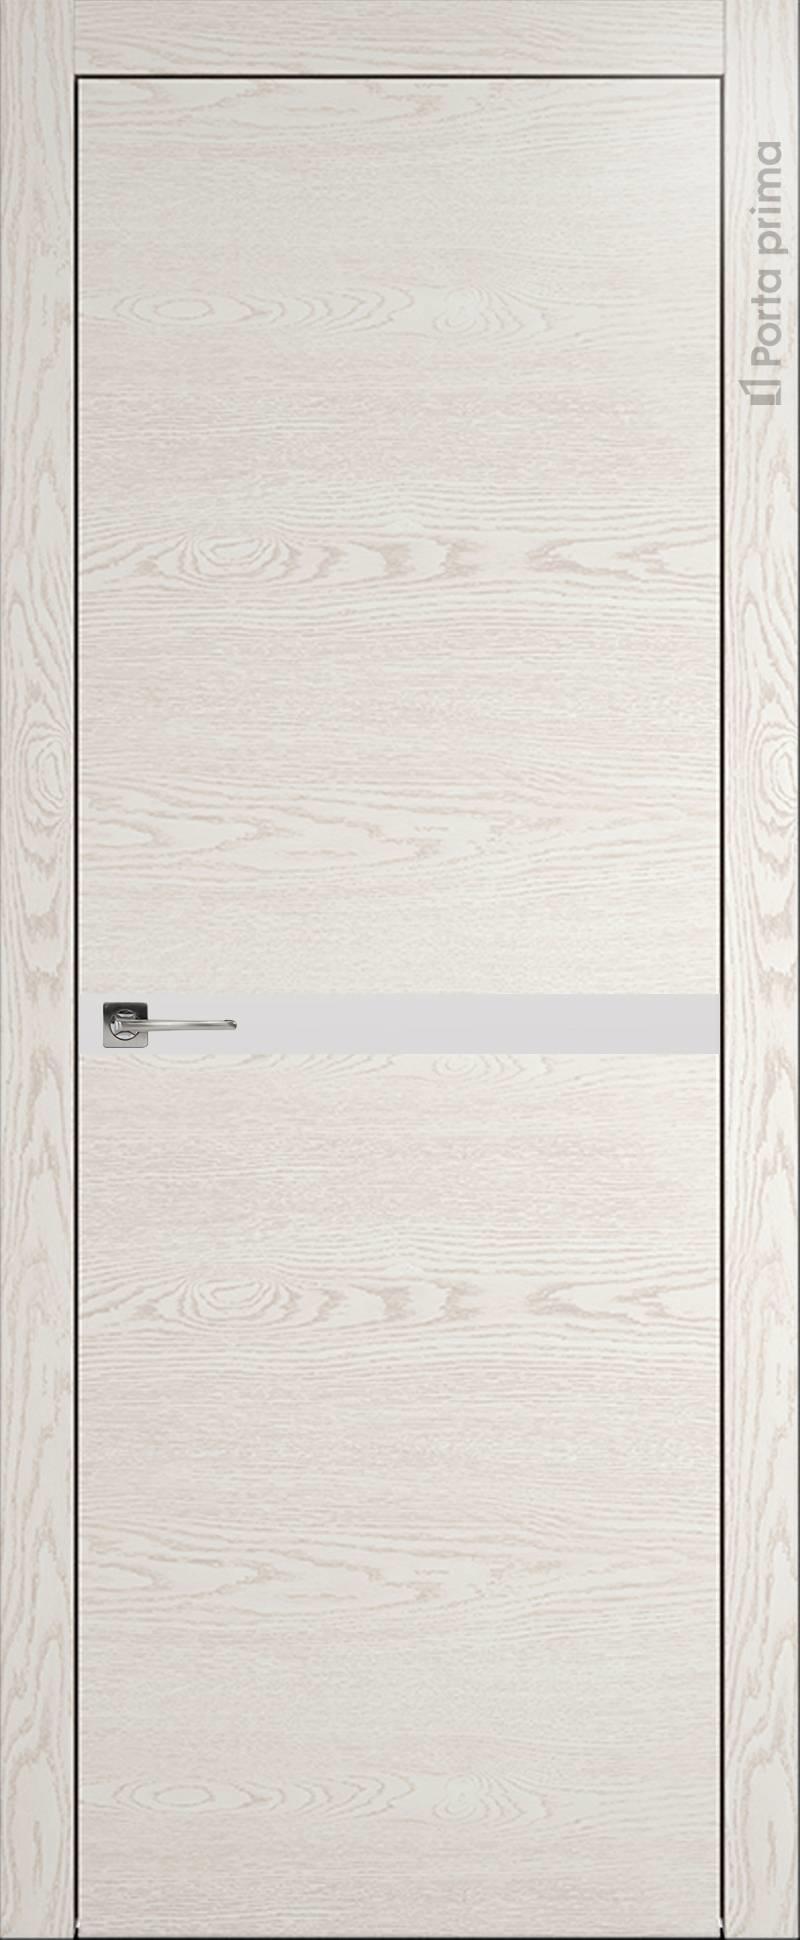 Tivoli Б-4 цвет - Белый ясень (nano-flex) Без стекла (ДГ)